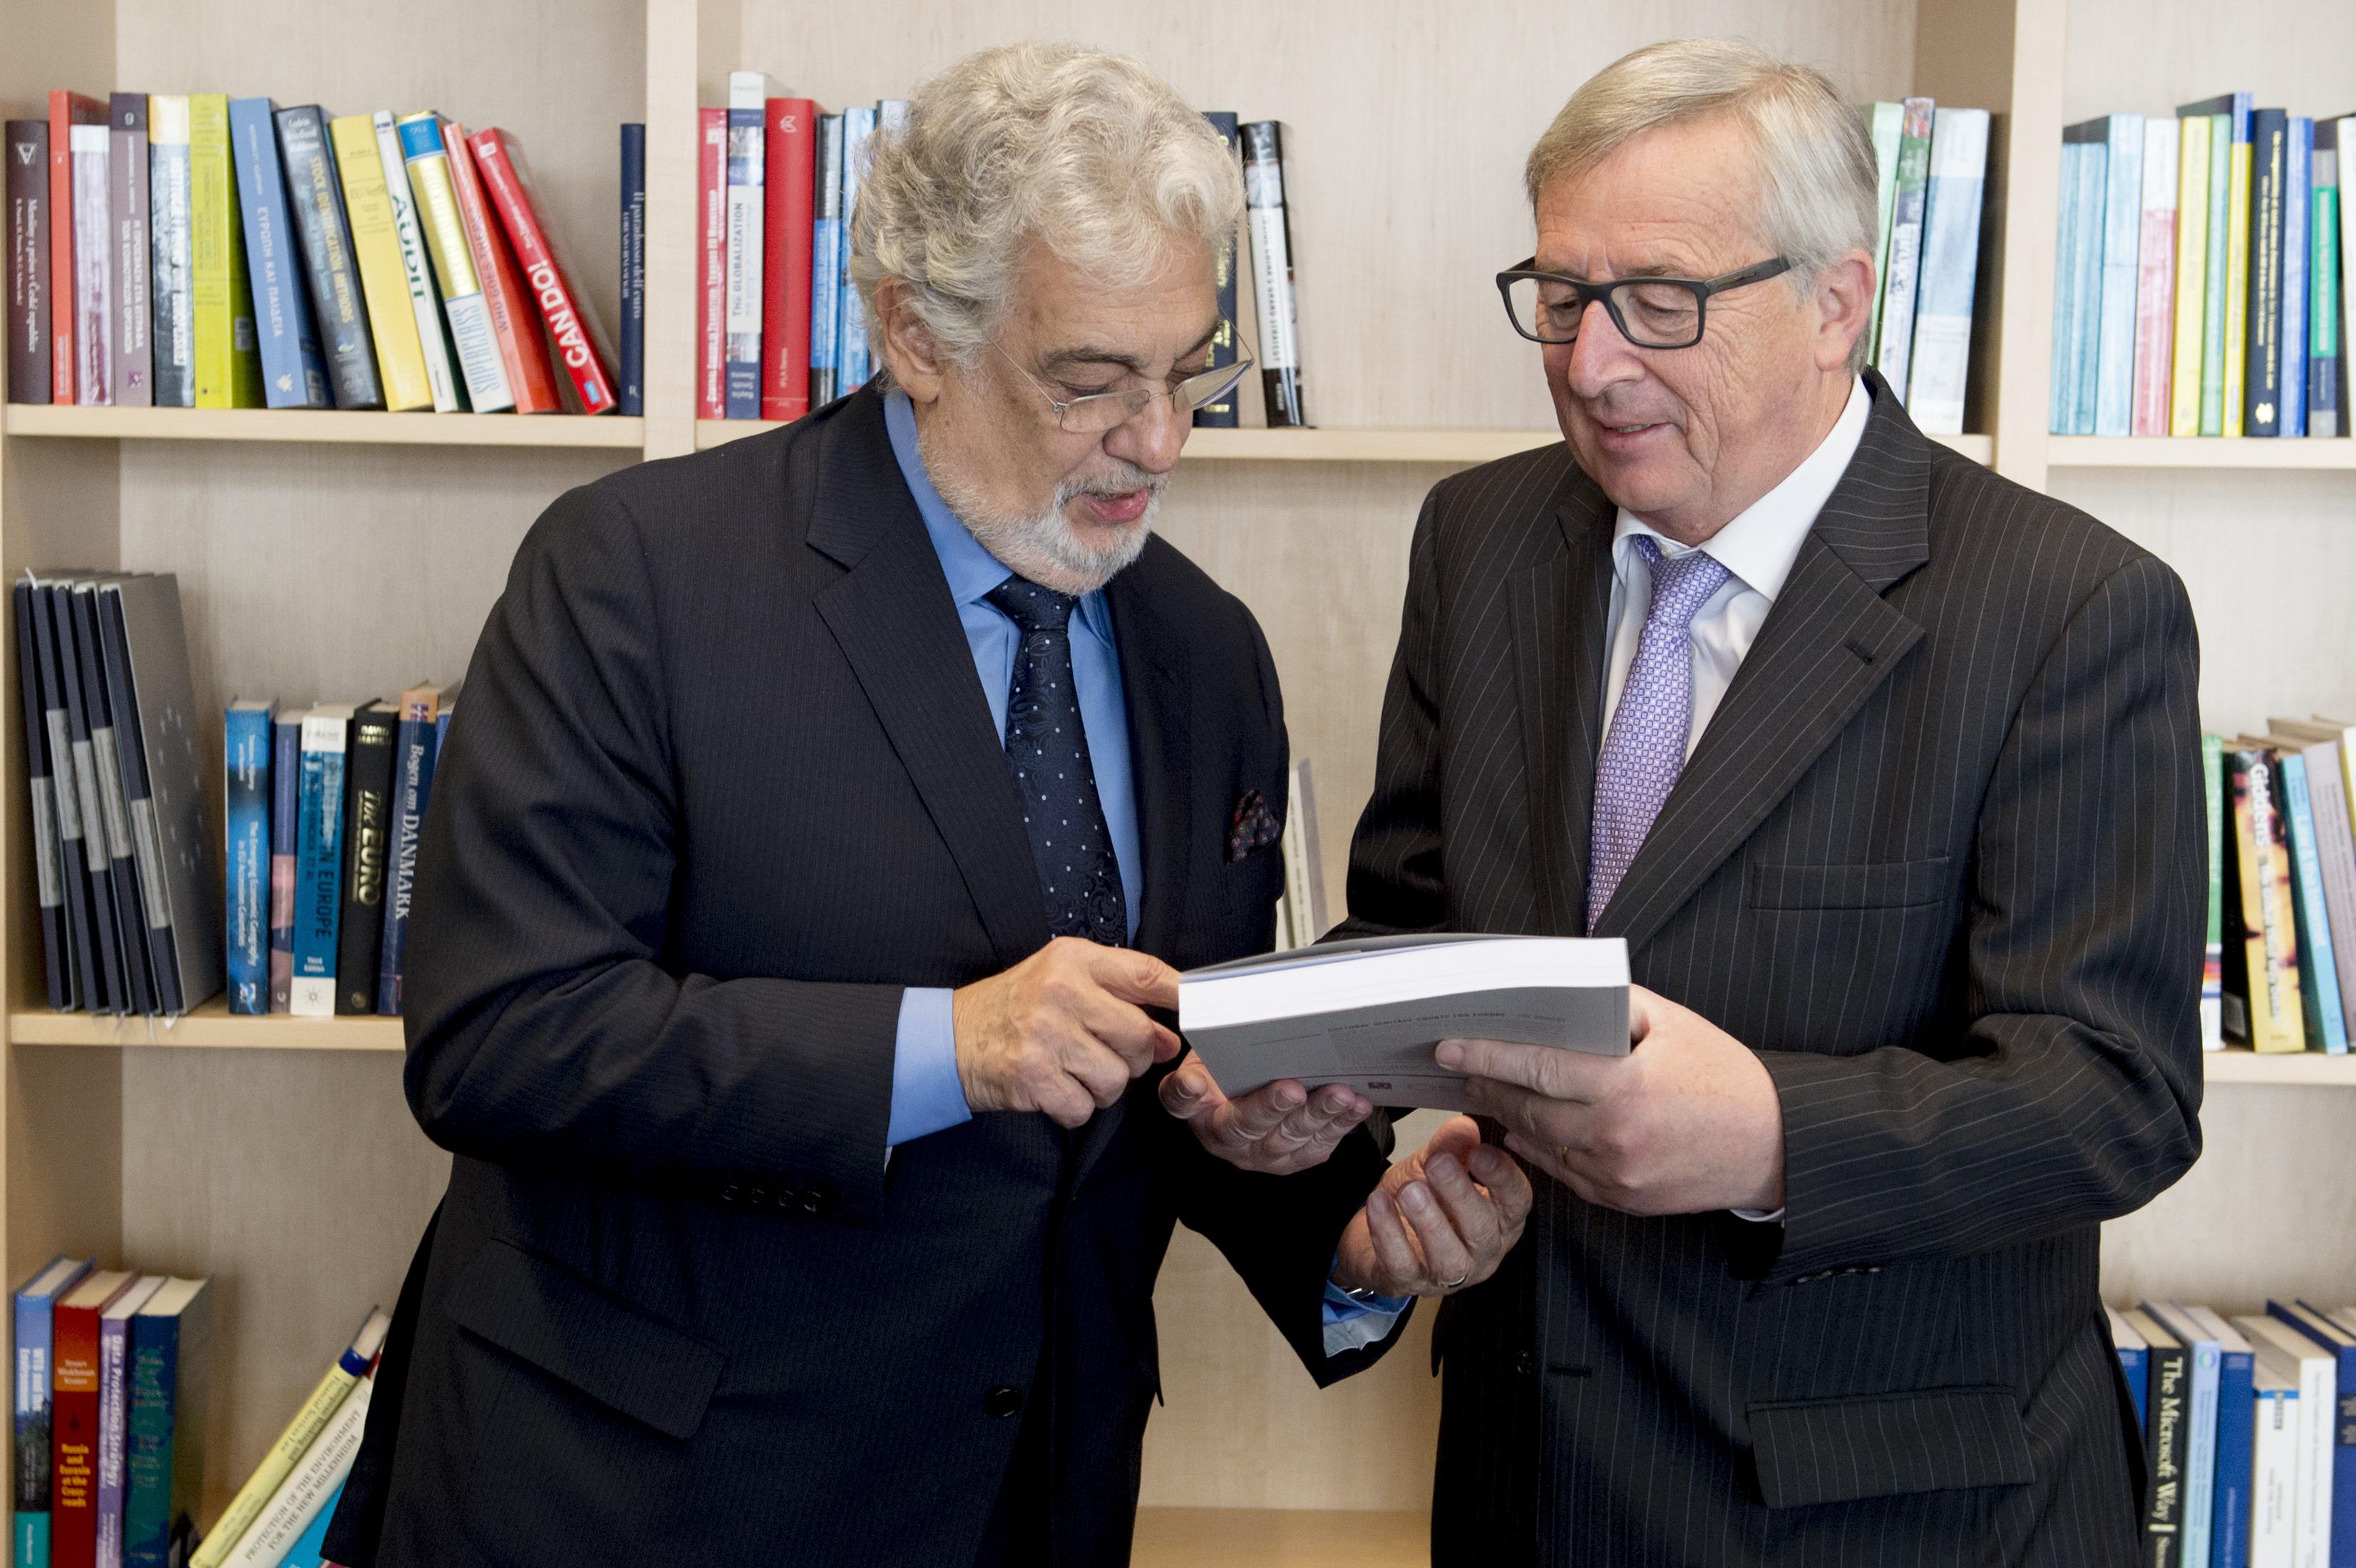 Jean-Claude Juncker and Placido Domingo. Photo: Courtesy of European Commission